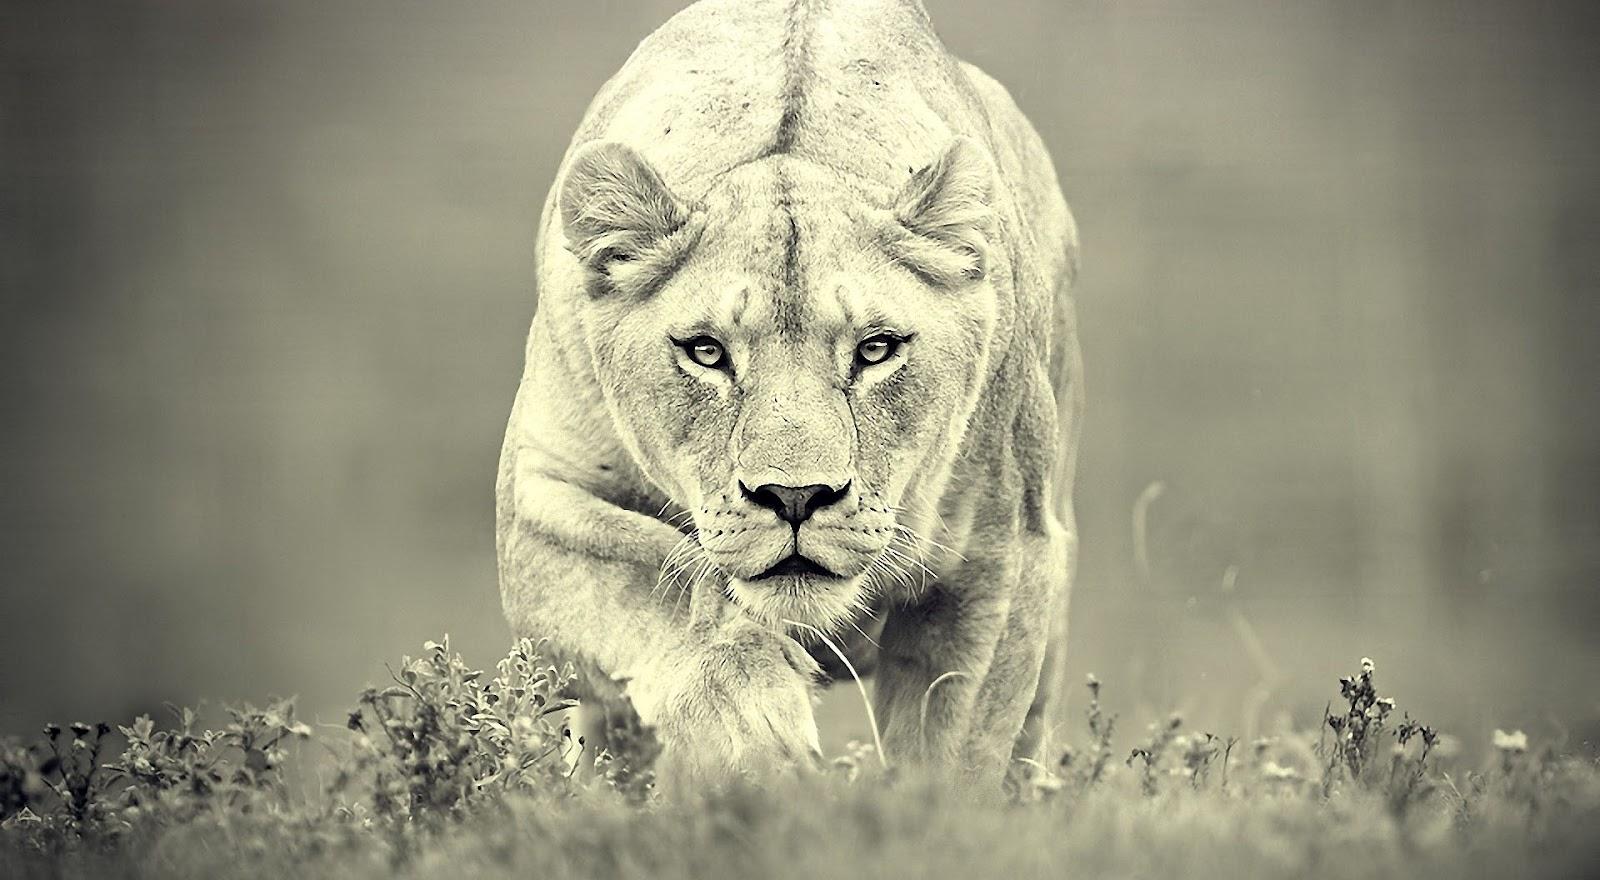 http://2.bp.blogspot.com/-Dr_r4XosGJs/UE3PjP1VzZI/AAAAAAAABeA/Rl0hu4bMHlM/s1600/lioness_hunting-wallpaper-1920x1080.jpg